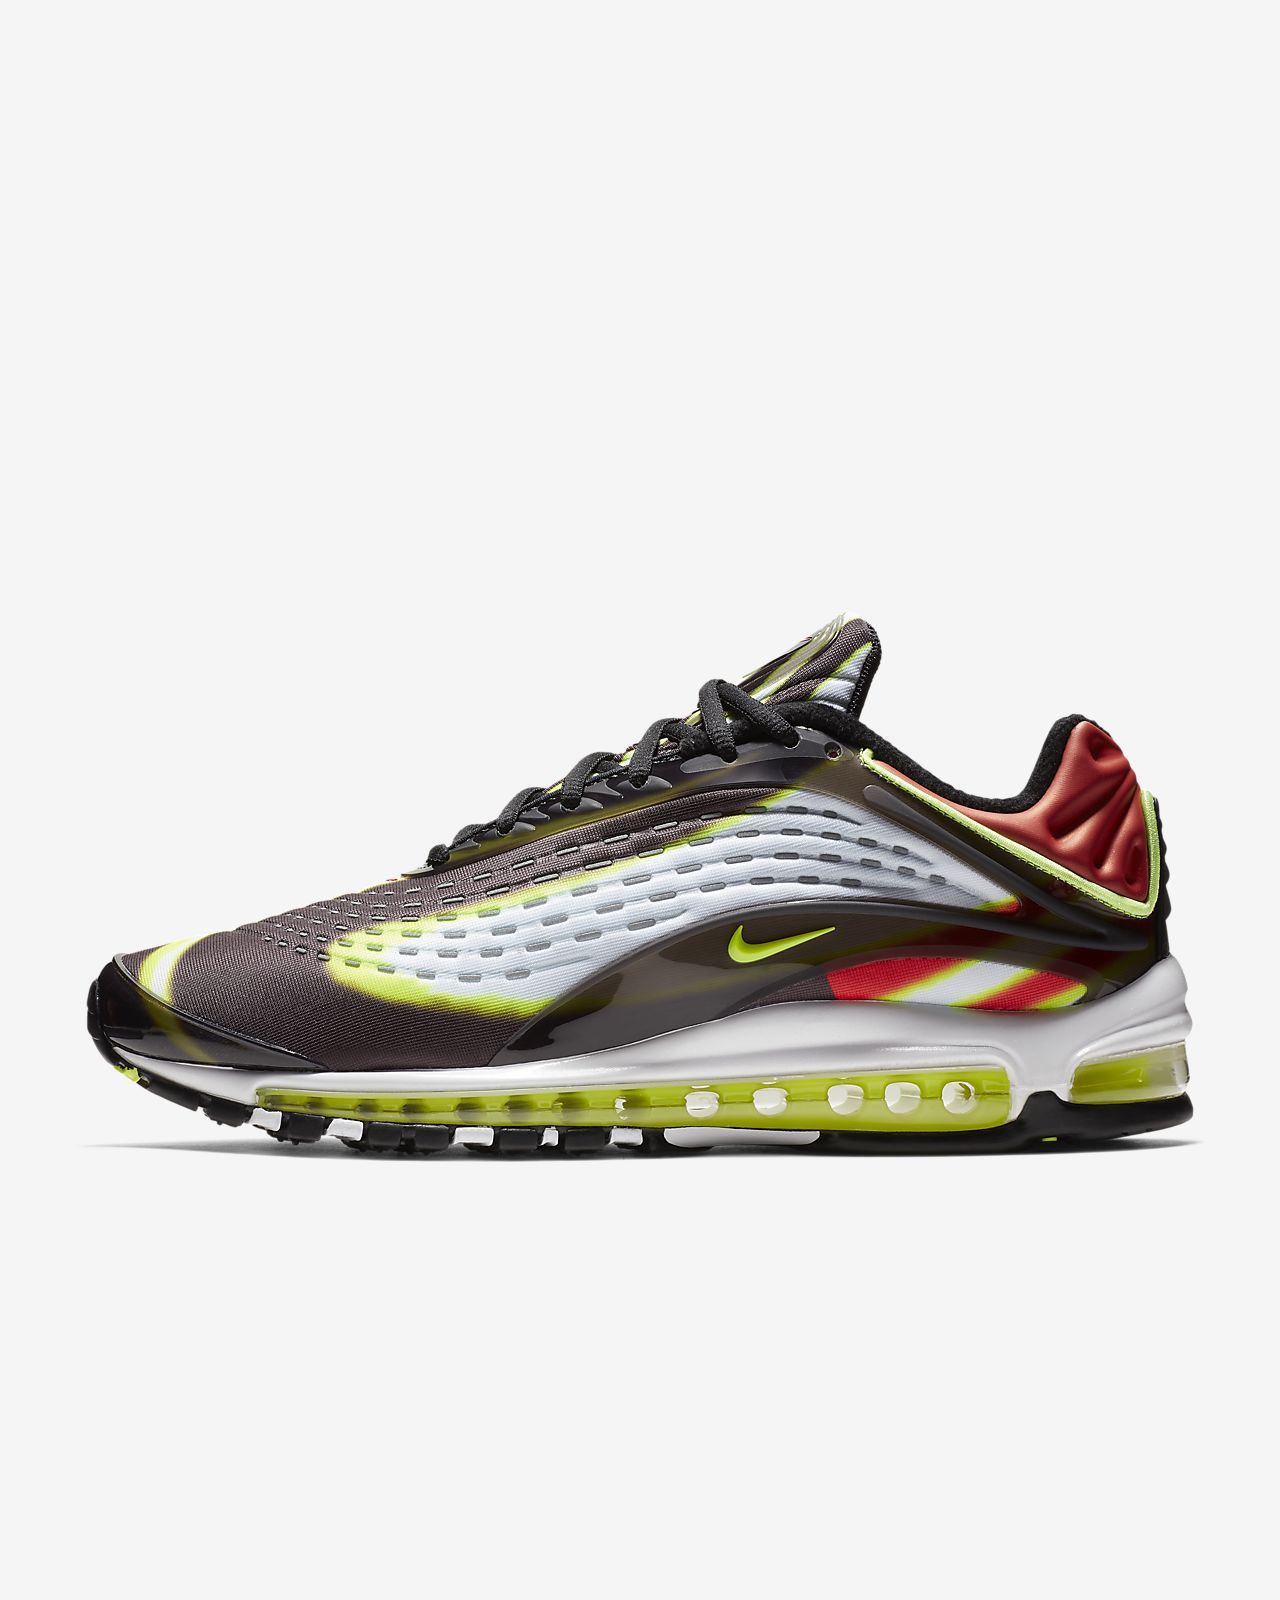 Nike Air Max Deluxe男子运动鞋